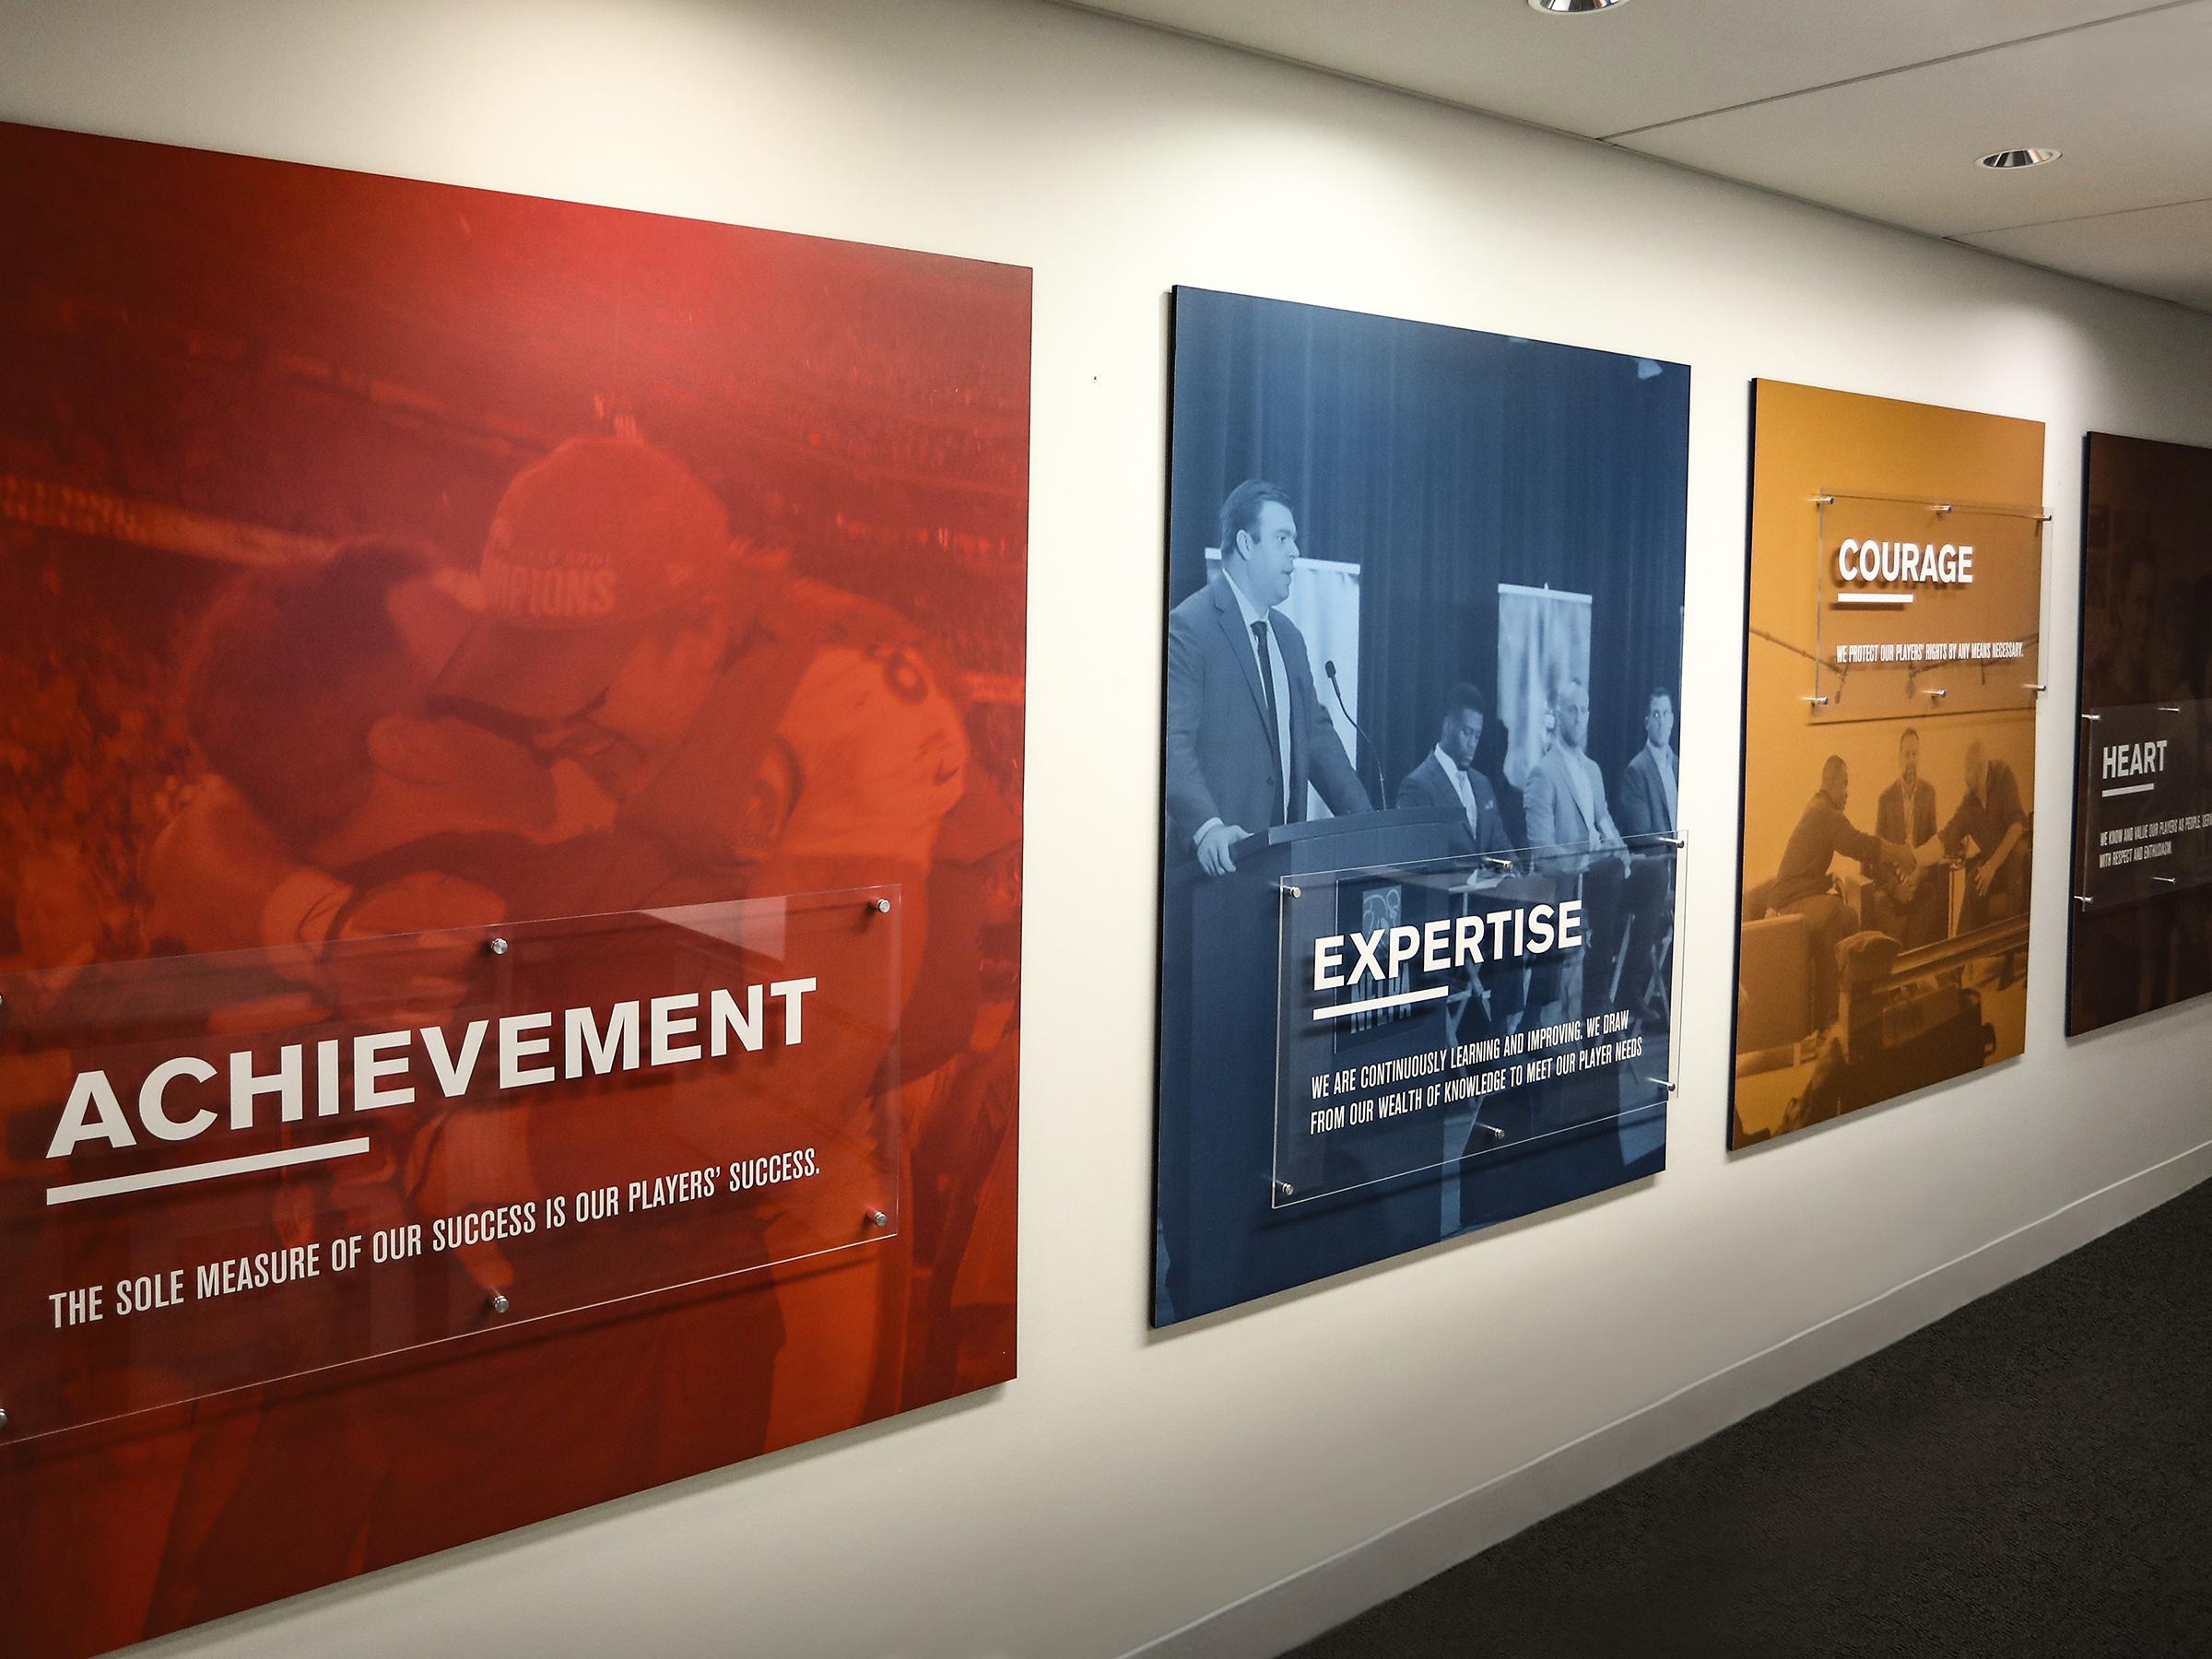 Vision & Values Wall Graphics